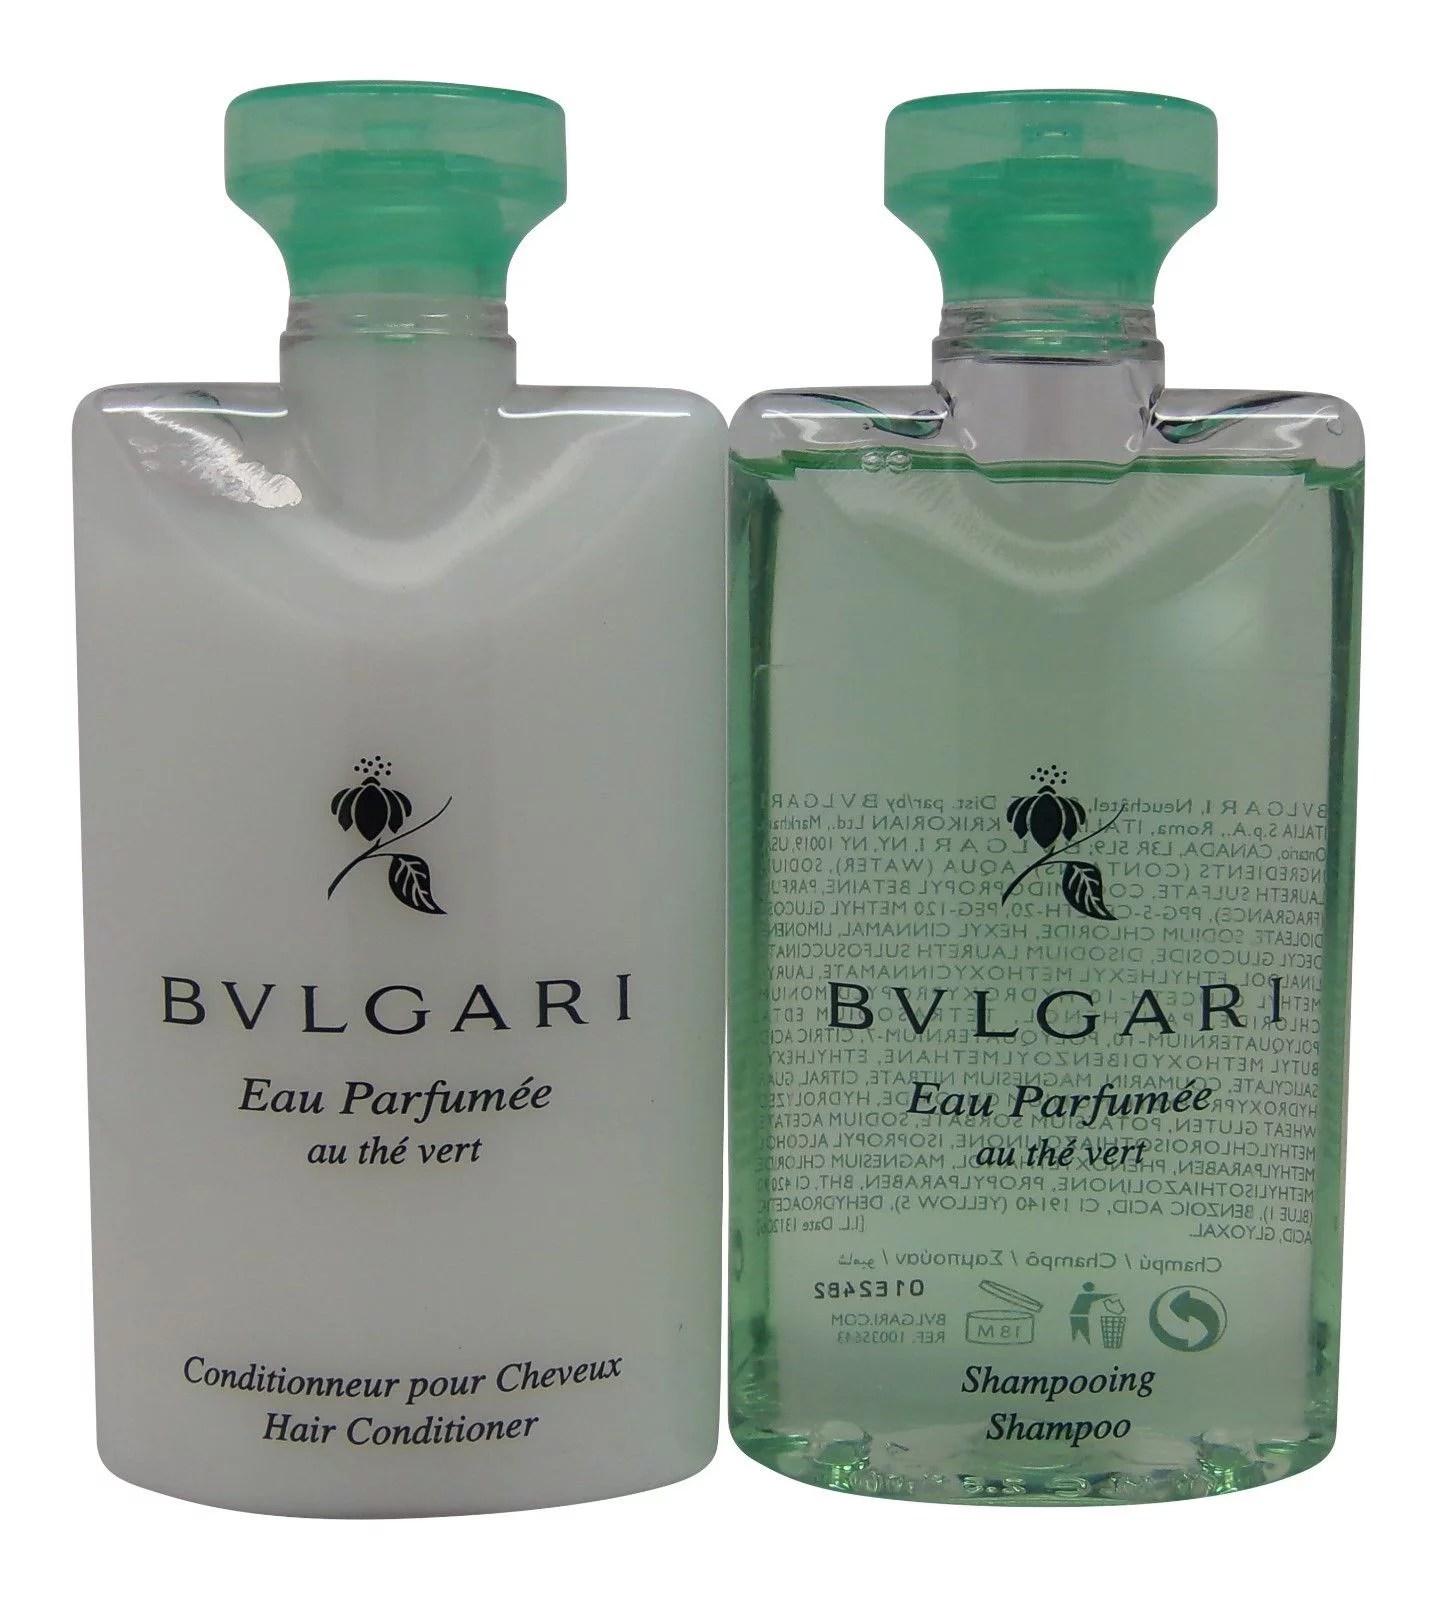 Bulgari - Bvlgari au the vert Green Tea Shampoo & Conditioner lot of 2 (1 of each) - Walmart.com